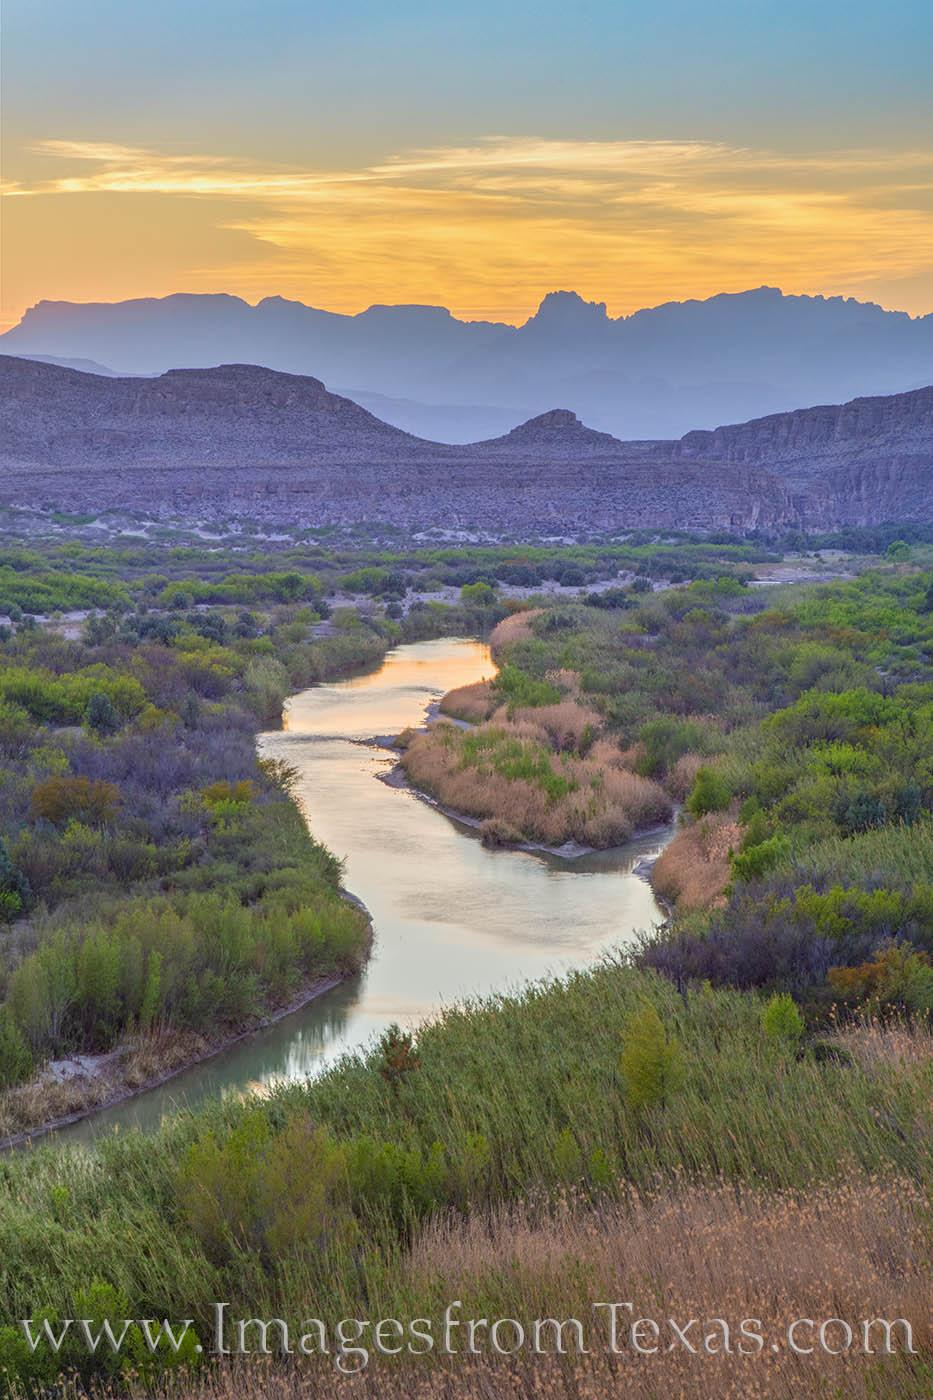 big bend national park, big bend prints, rio grande, border, west texas, chisos mountains, texas national parks, texas landscapes, texas prints, photo